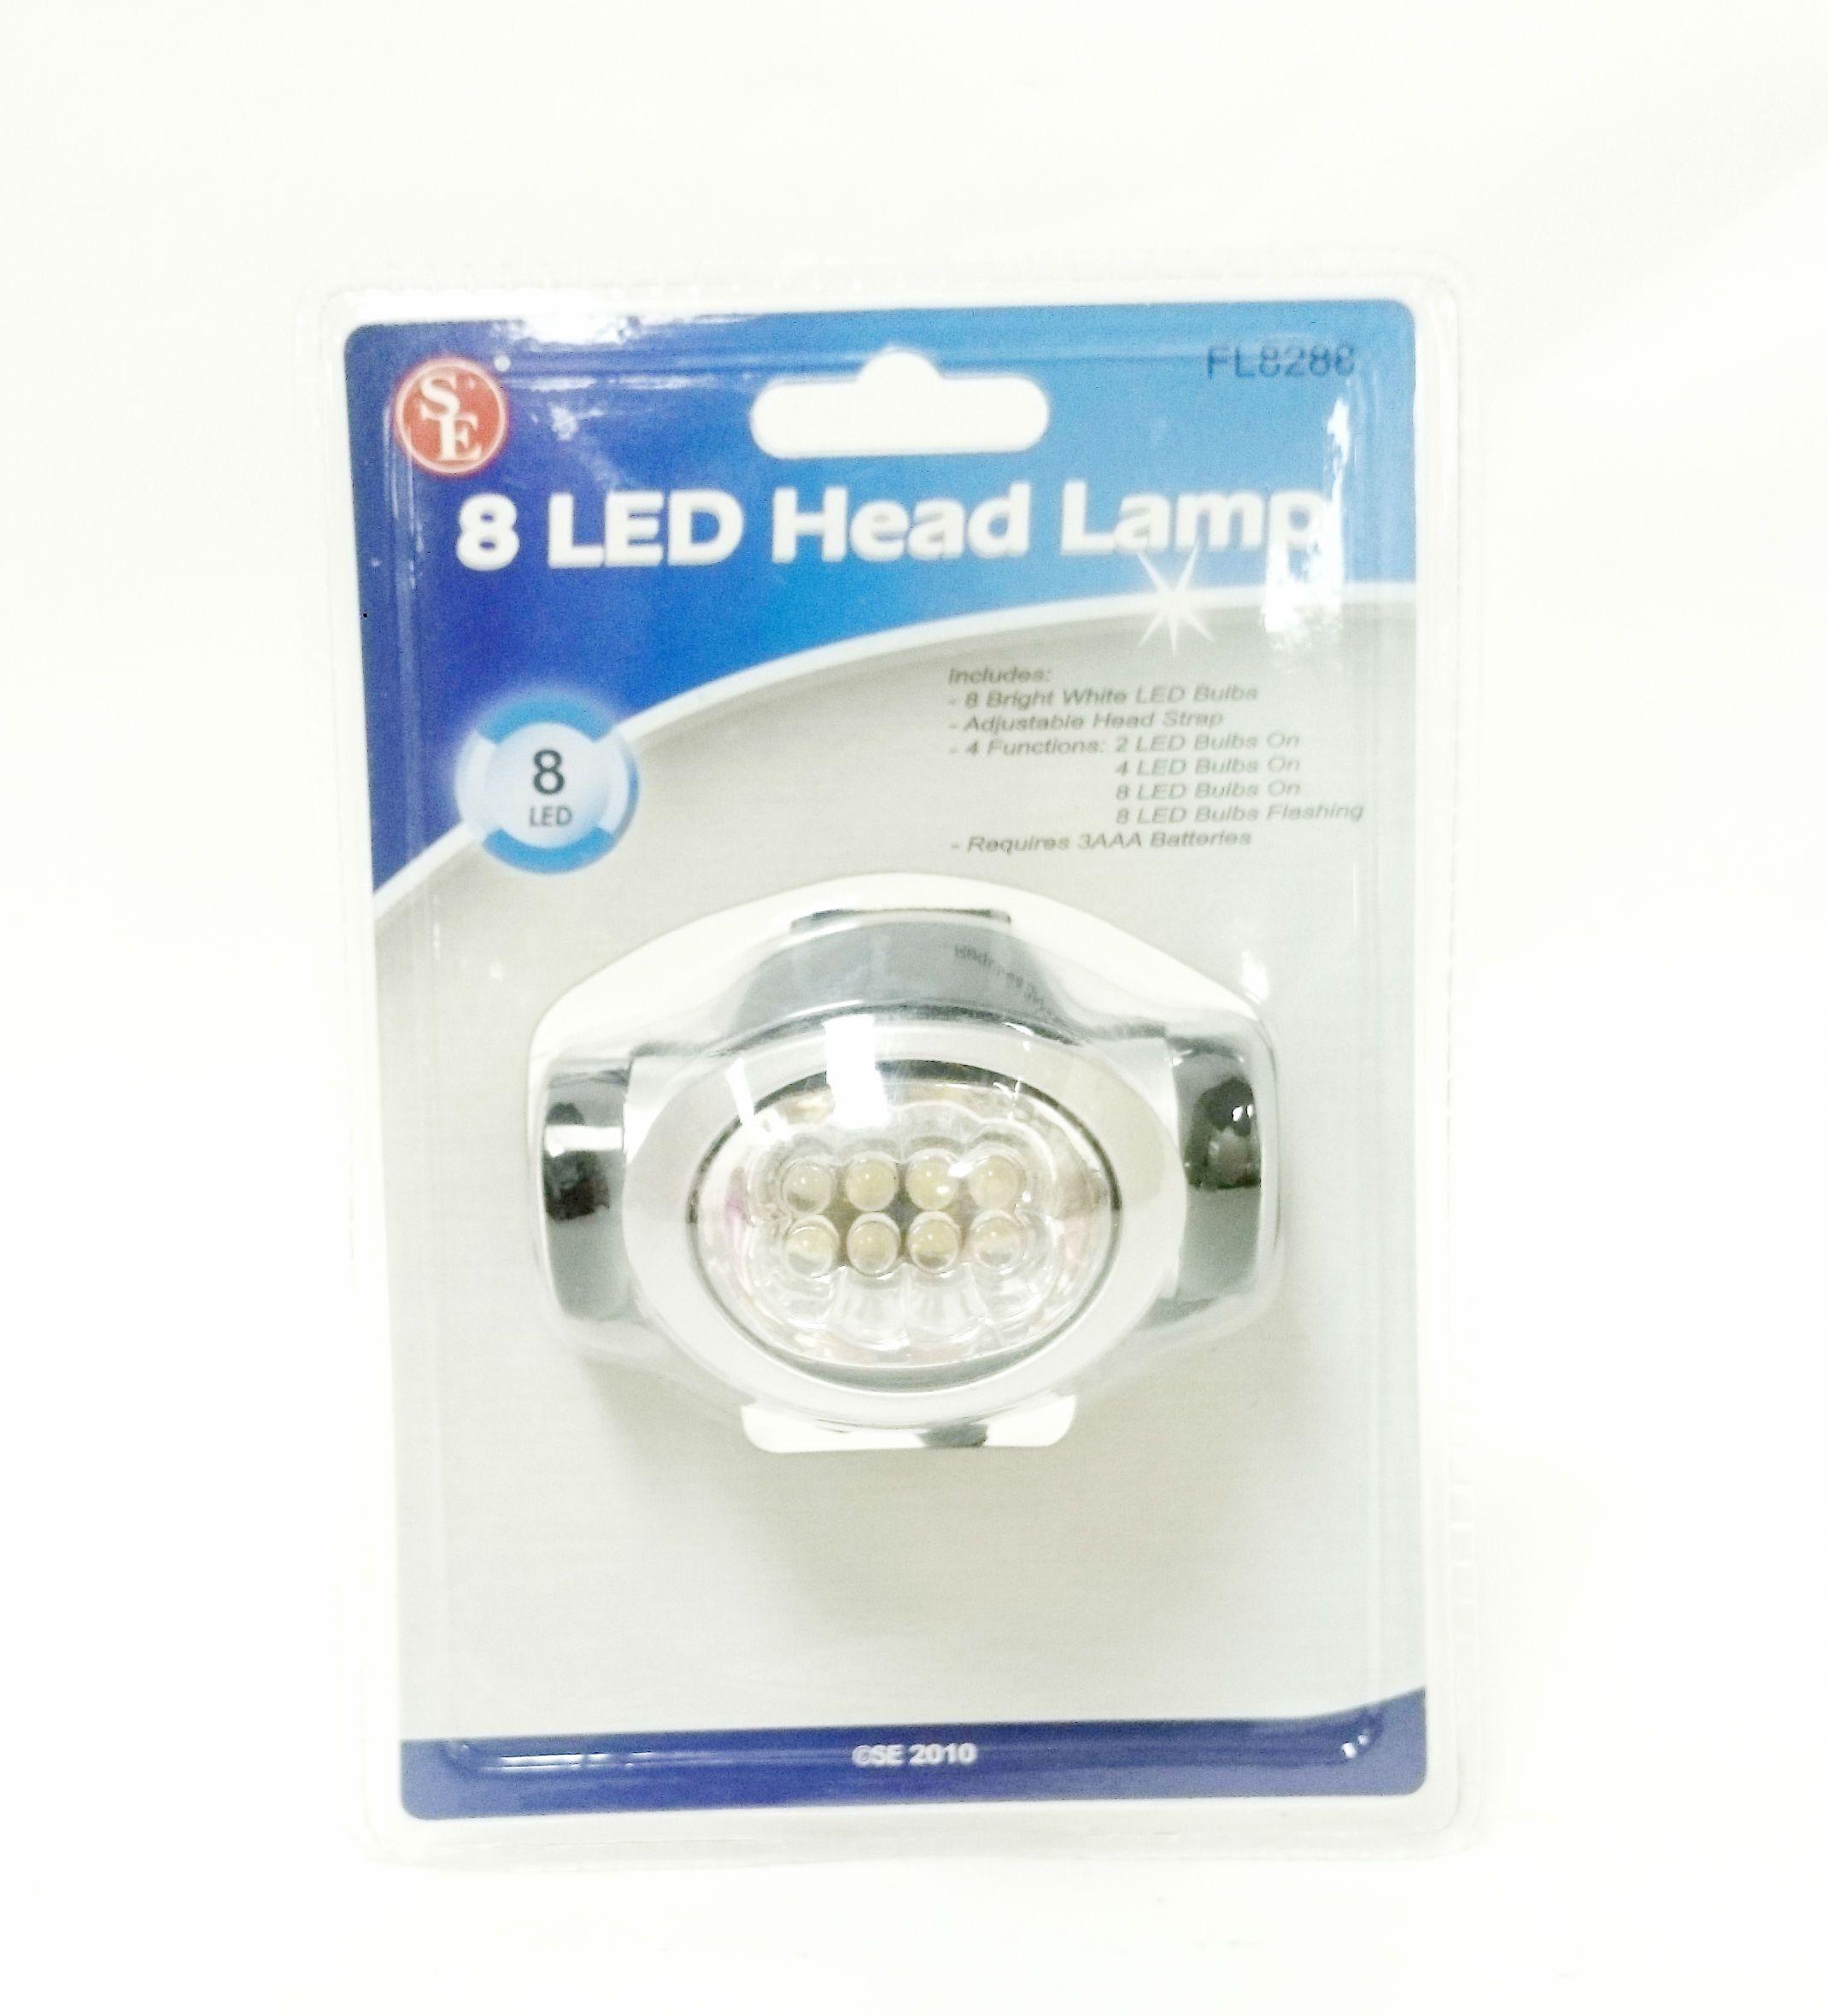 8 LED Head lamp only 2.99! Led head, Headlamp, Led